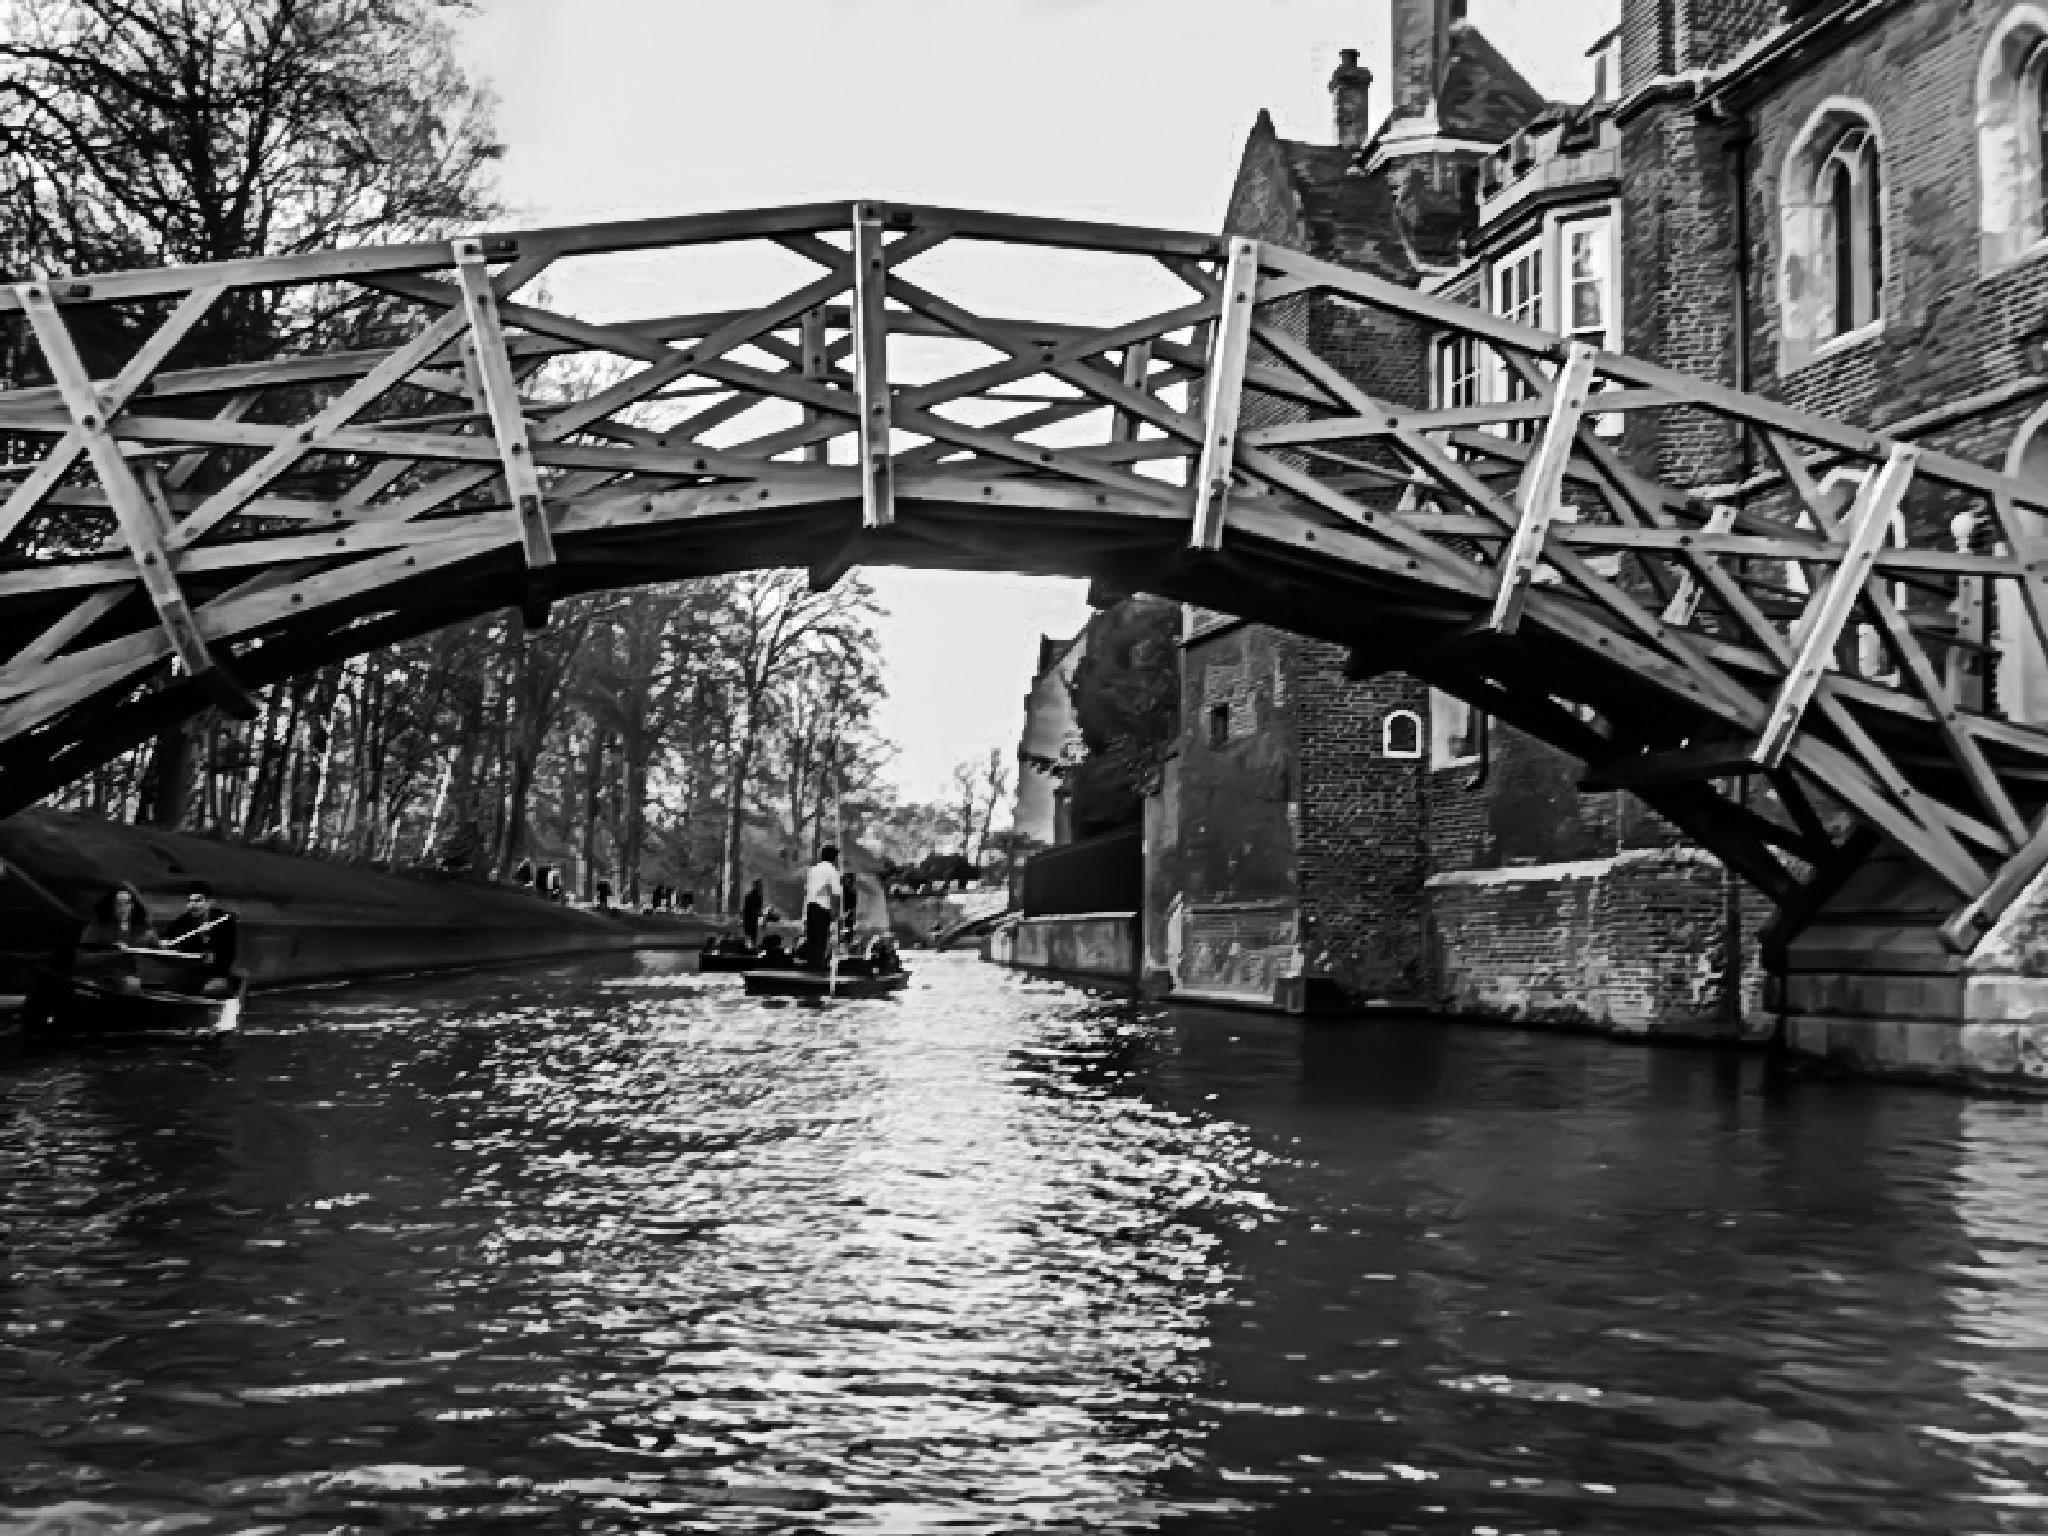 The Bridge by Vance Tan